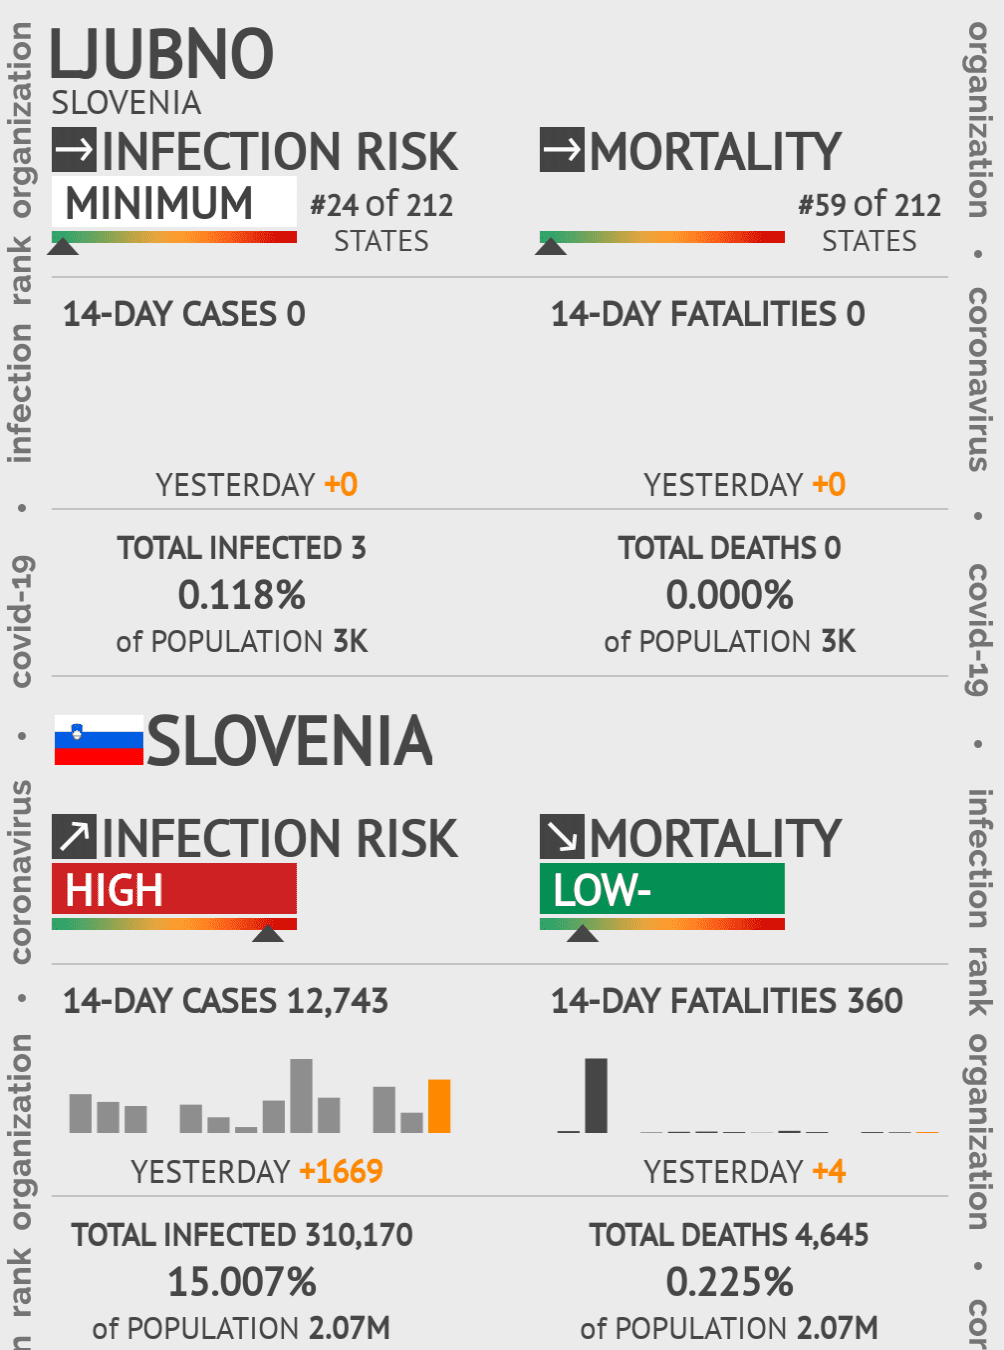 Ljubno Coronavirus Covid-19 Risk of Infection on May 14, 2020